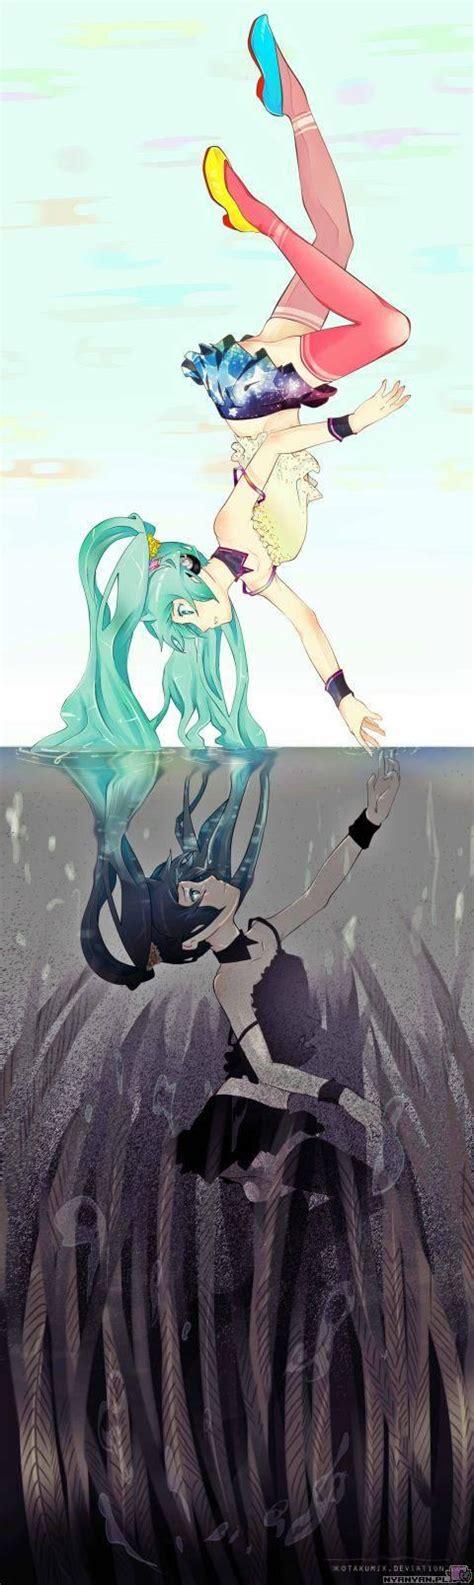 Hatsune Miku á ÿ Anime Nã O Hatsune Miku Na Anime Vocaloid W Zszywka Pl